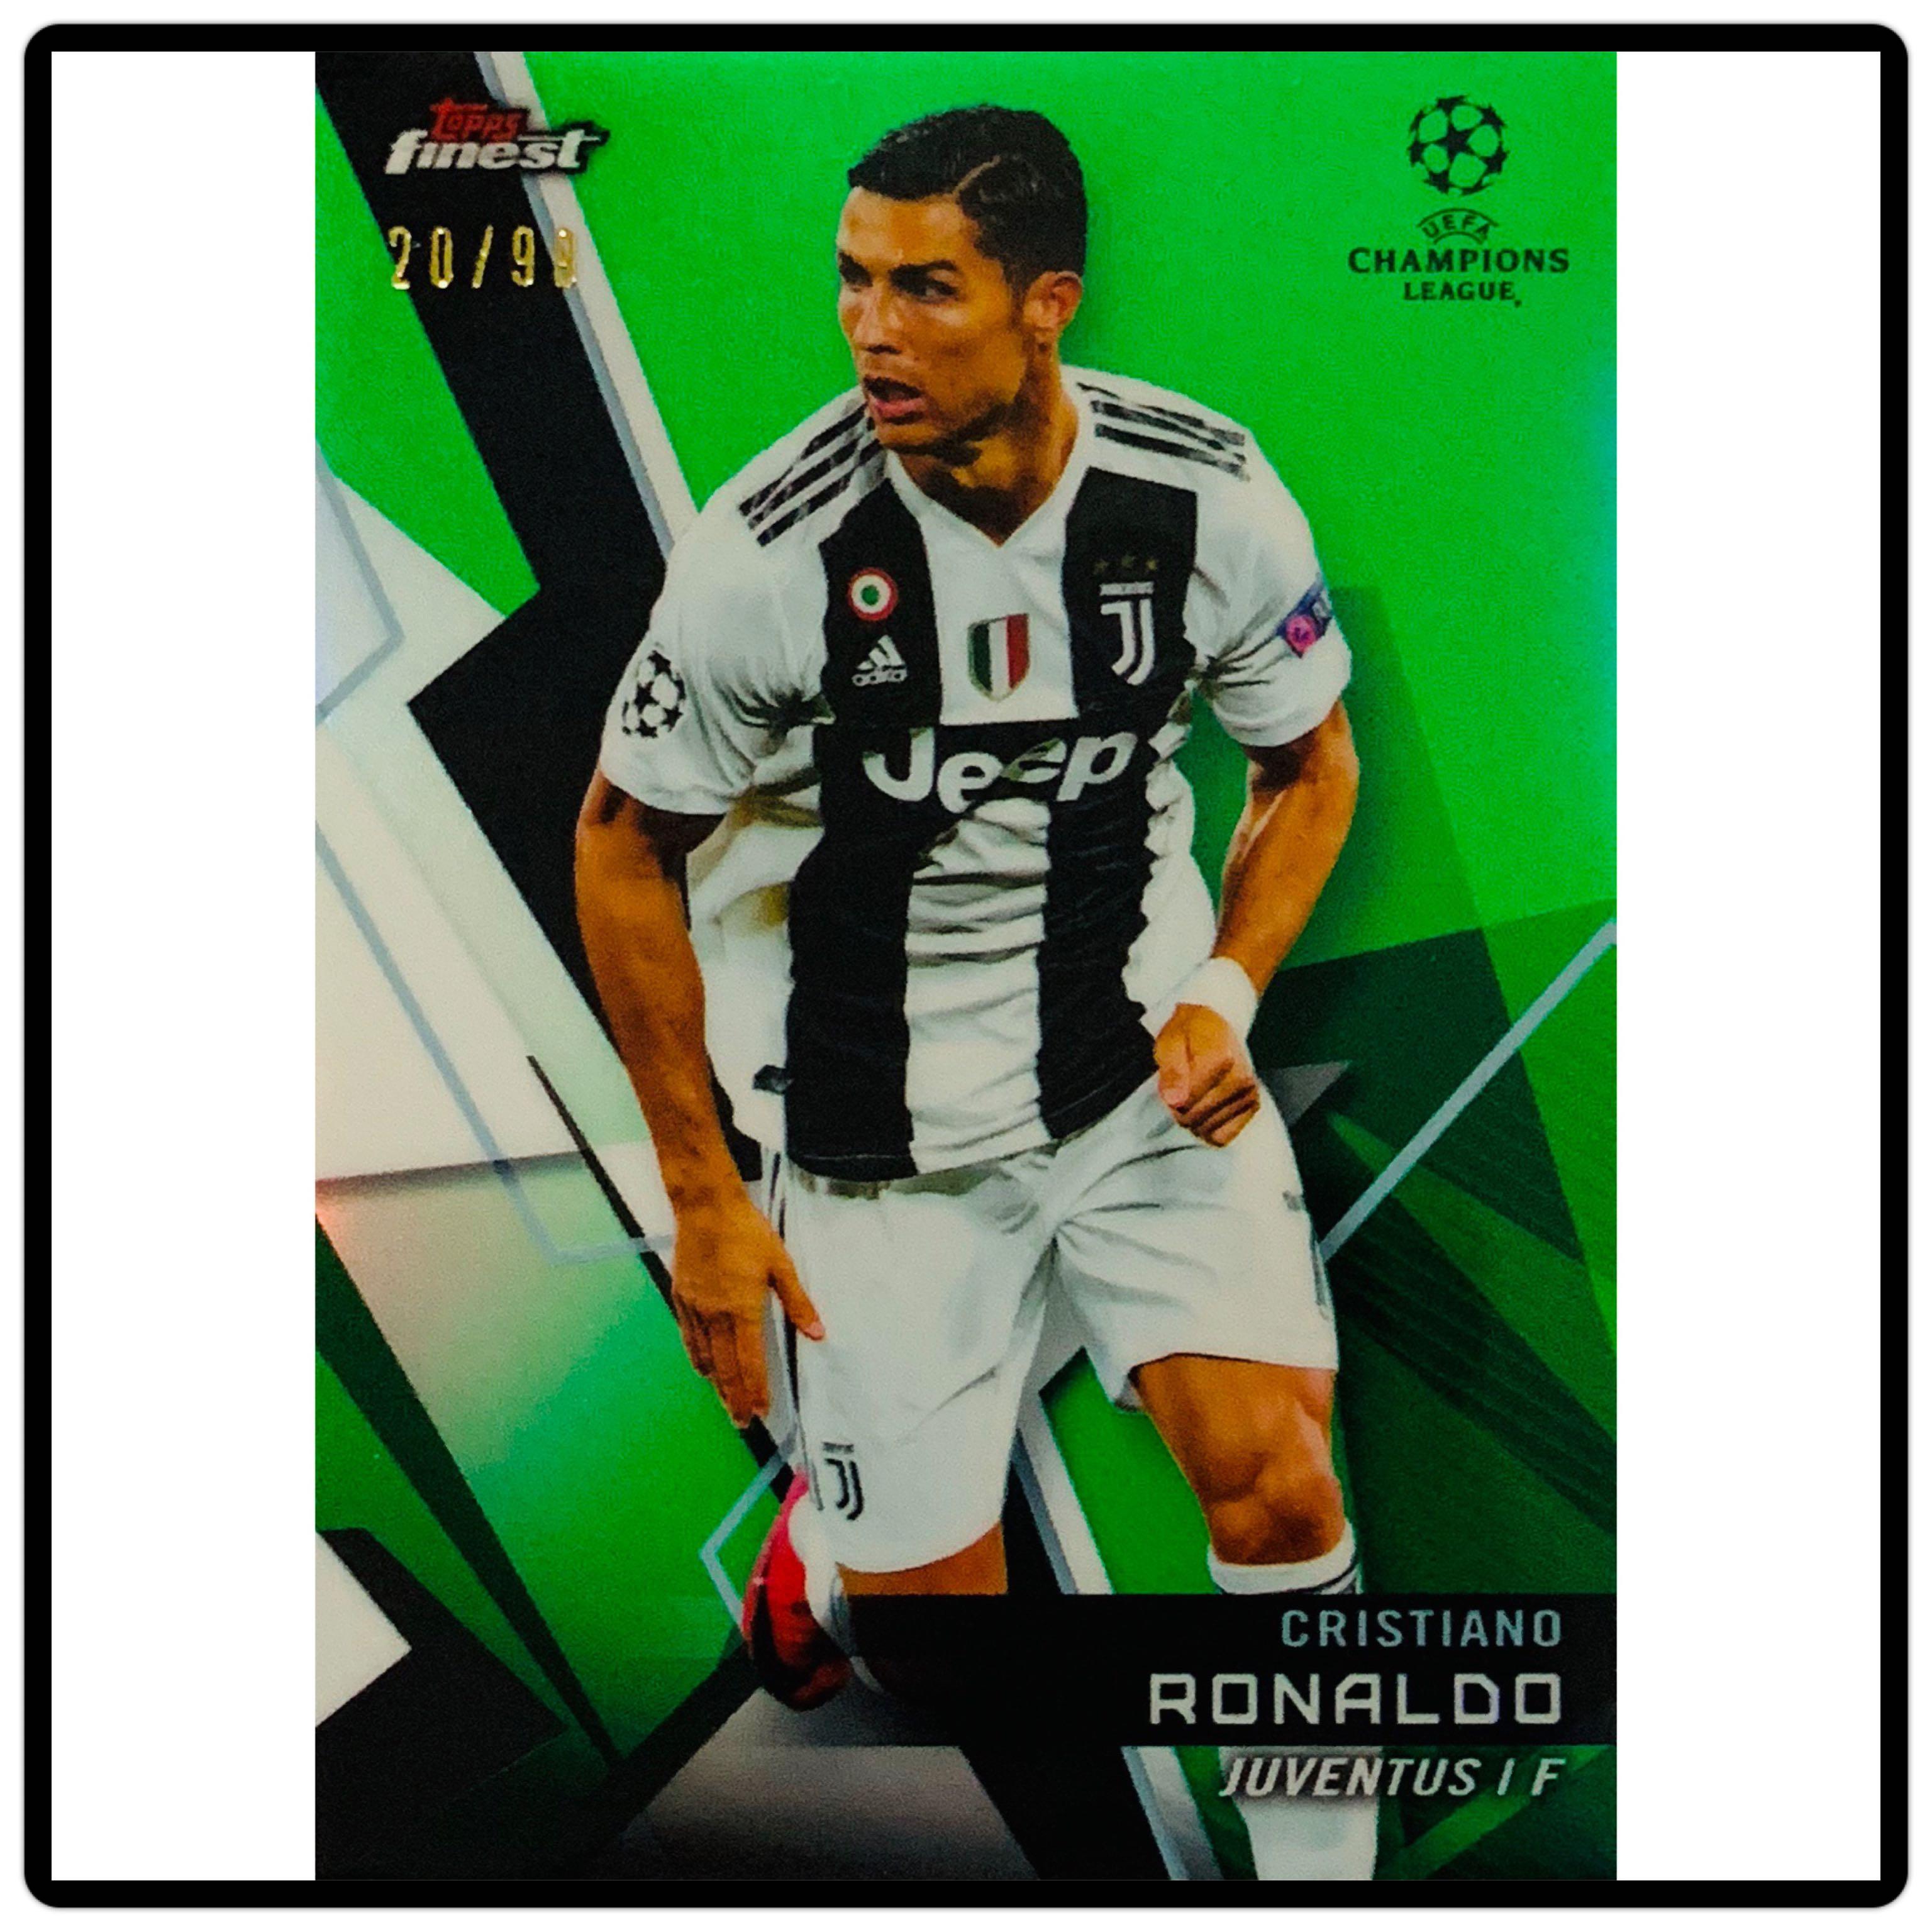 best service a5e74 cda04 Topps Finest Champions League 2018/2019 Cristiano Ronaldo Green Parallel  20/99